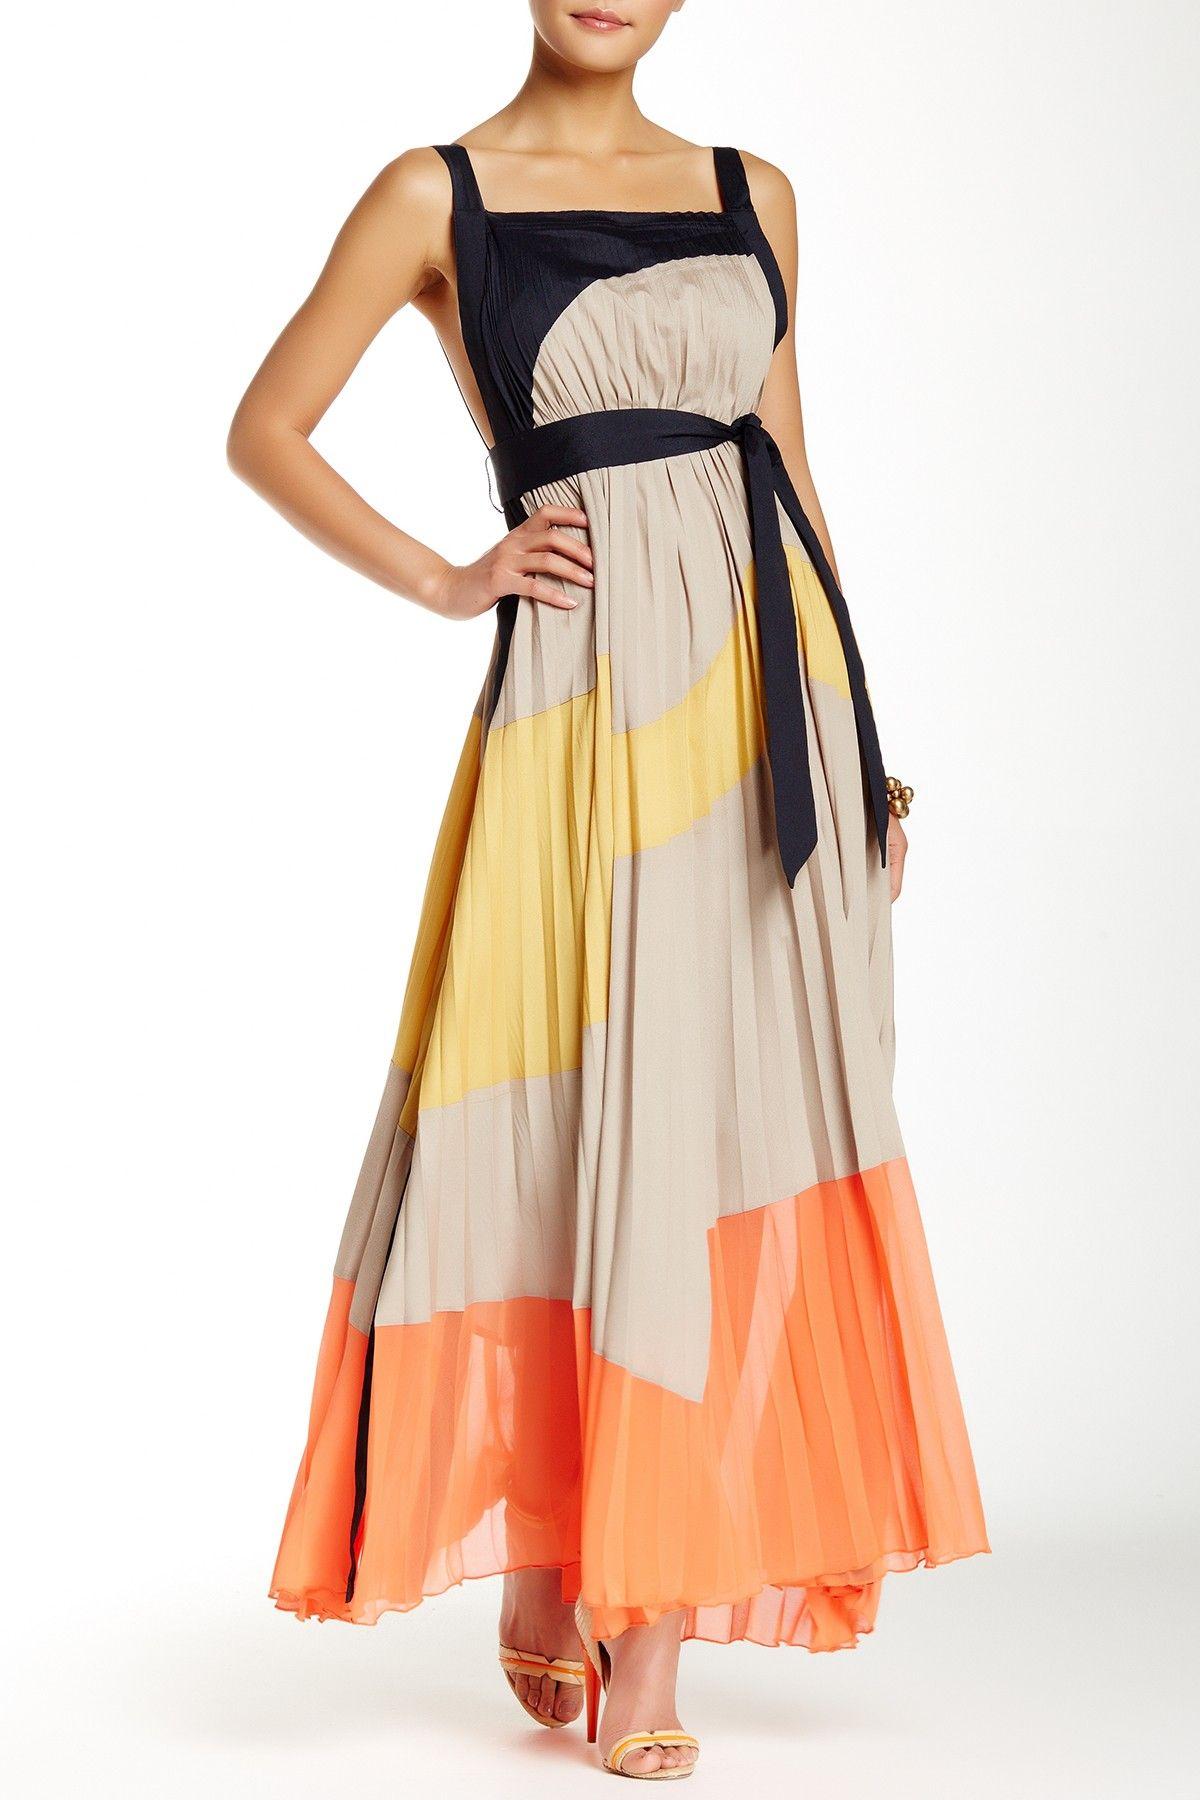 Gracia ny maxi dresses